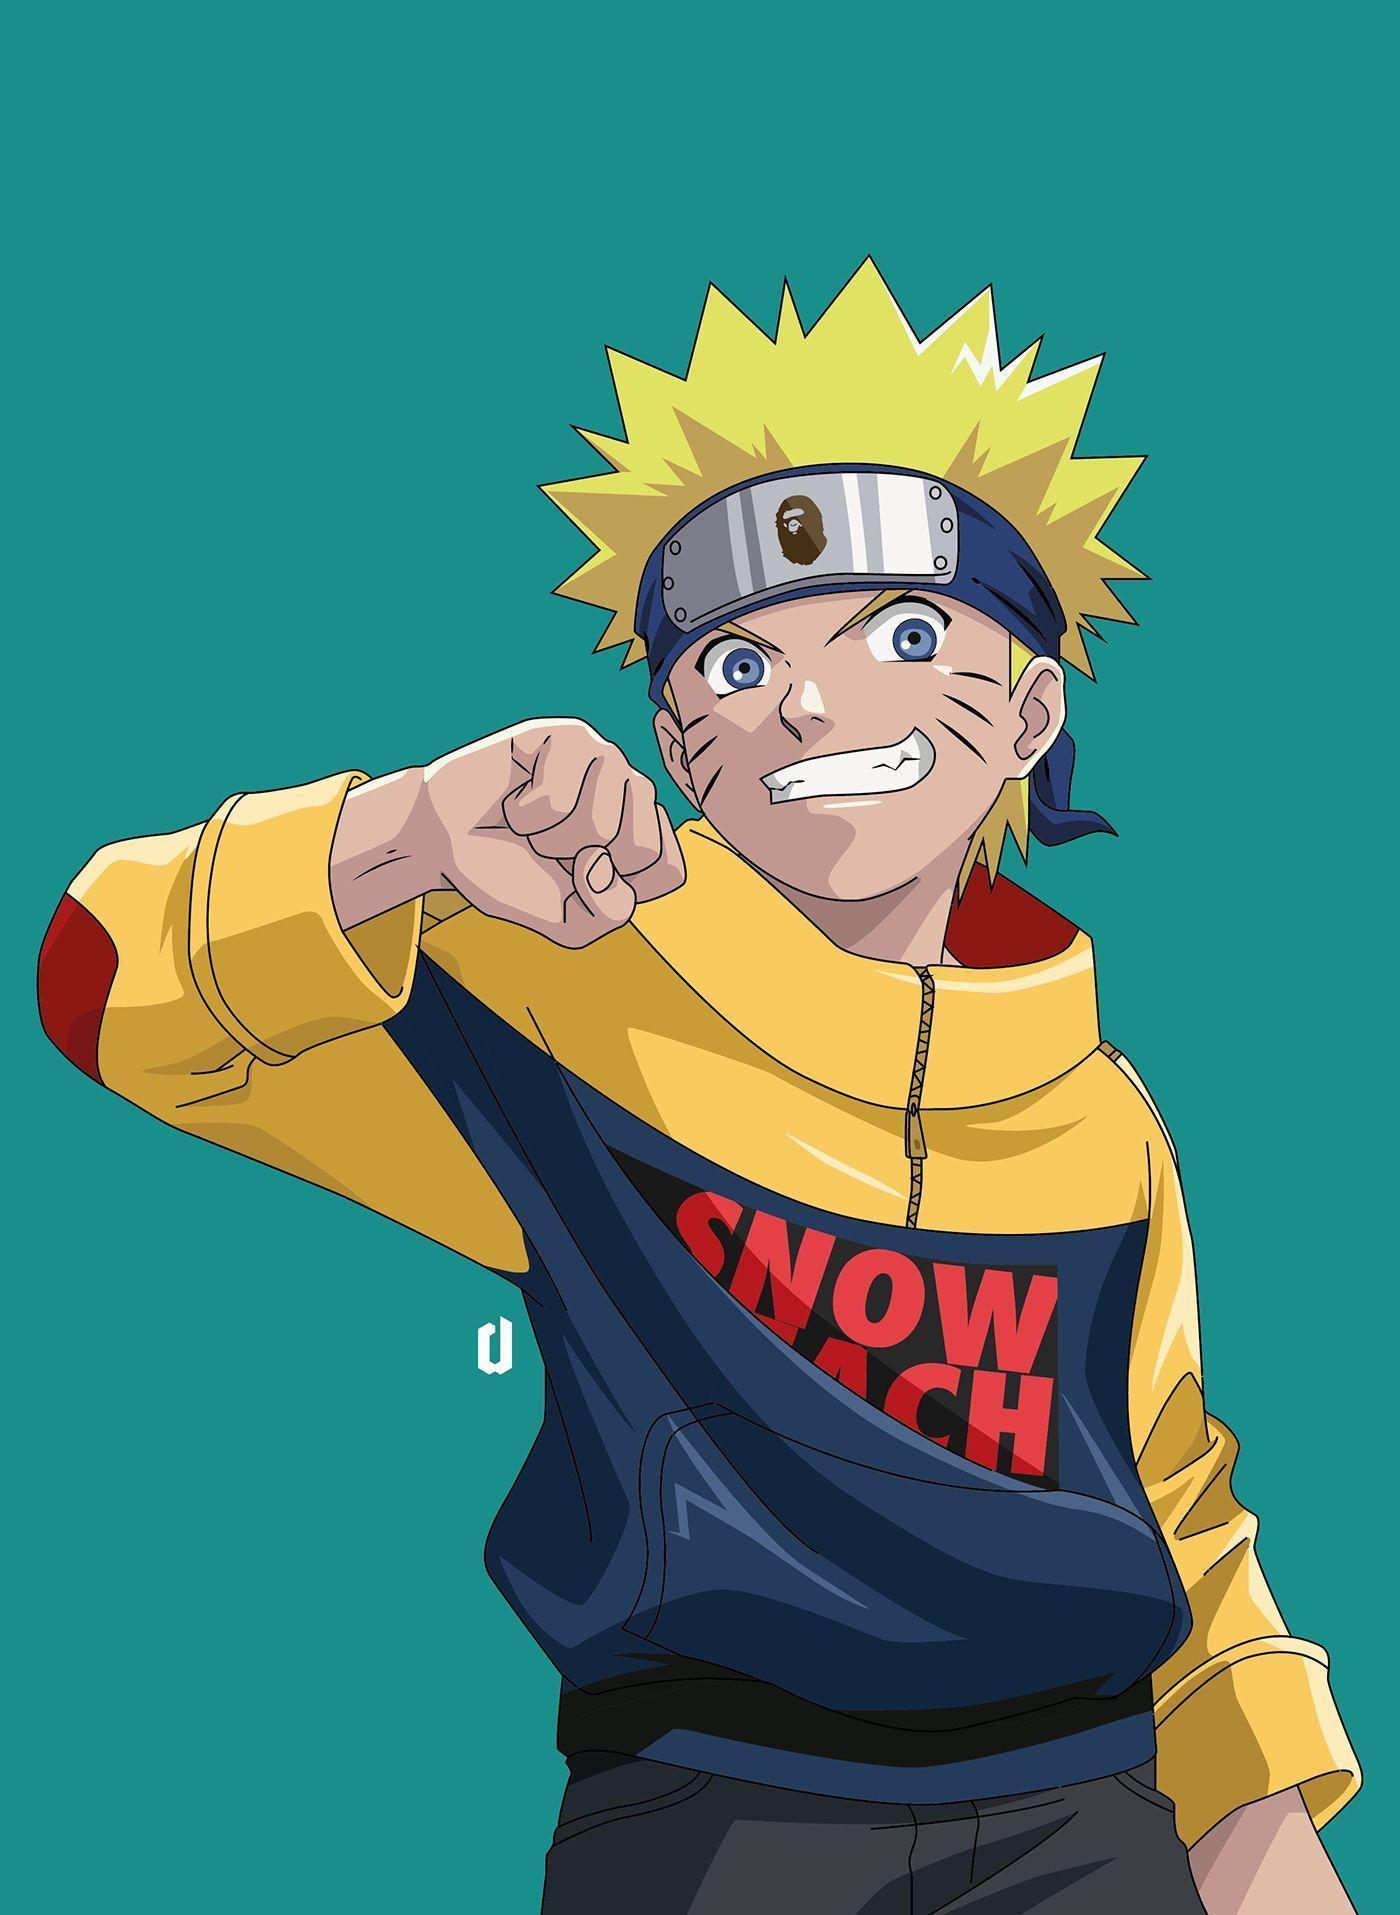 1080x1080 Gamerpic: Anime 1080x1080 Gamerpics: Kawaii Anime Renders